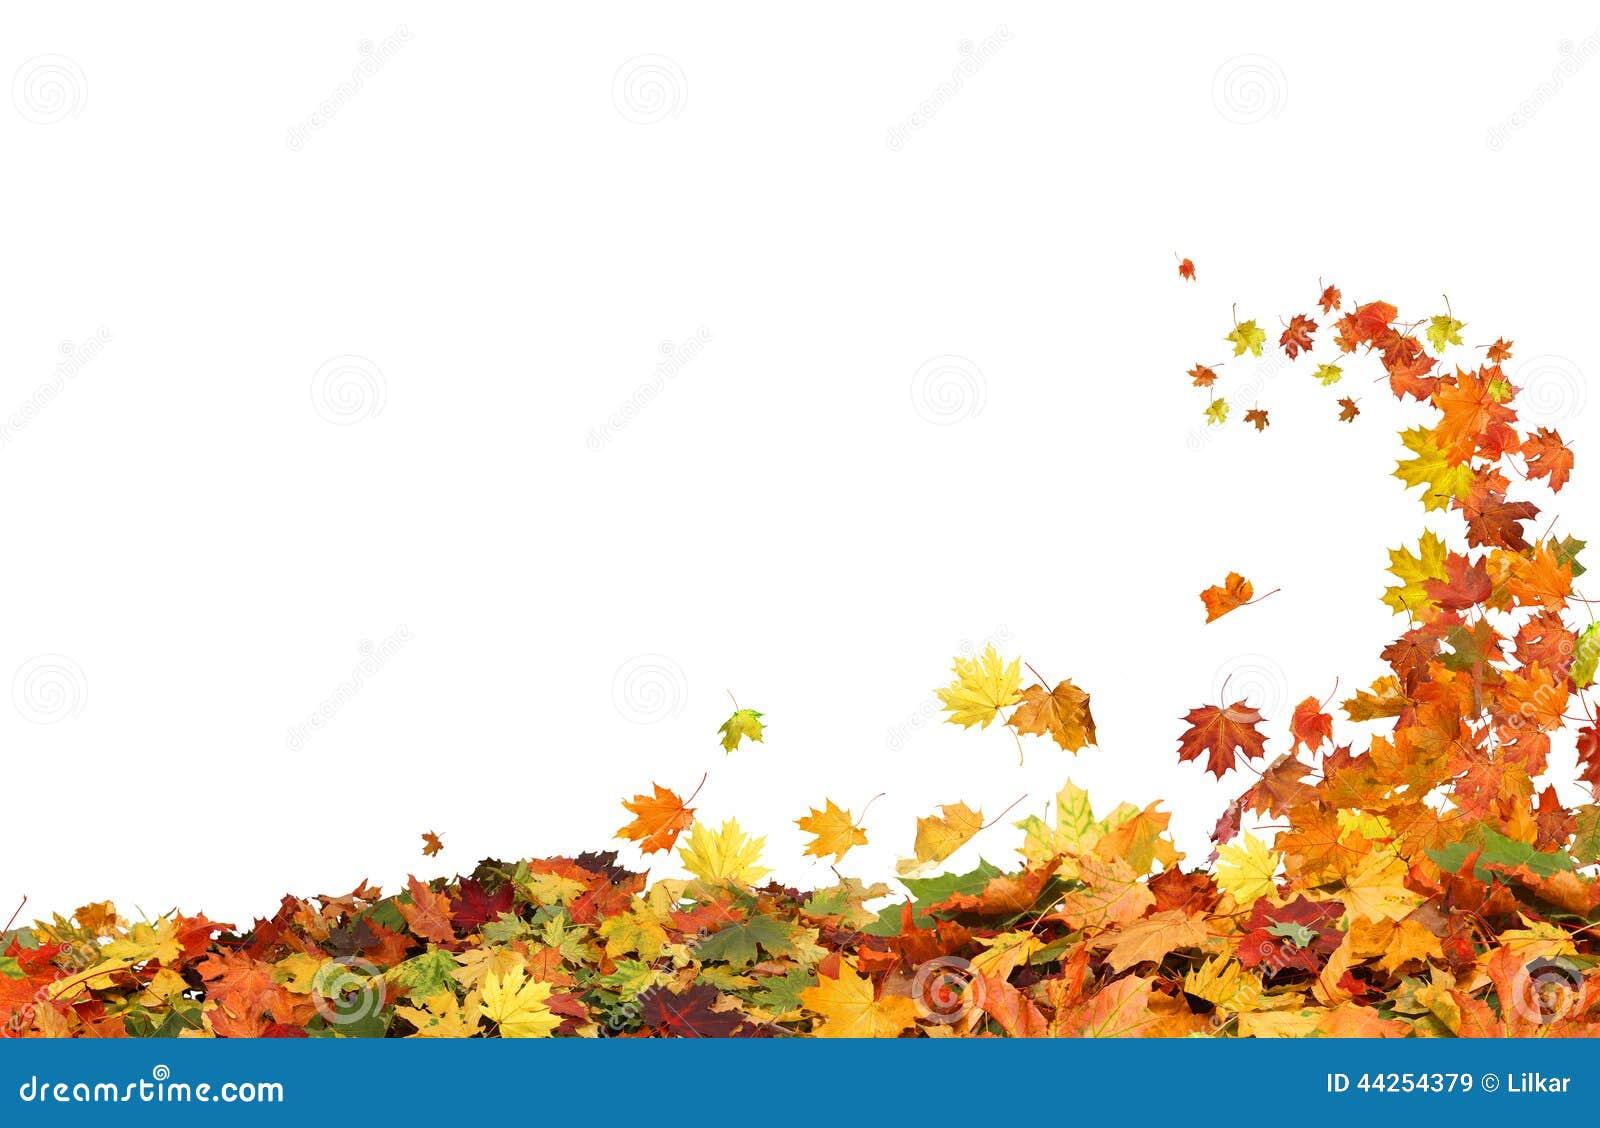 Autumn Falling Leaves Stock Image Image Of Falling